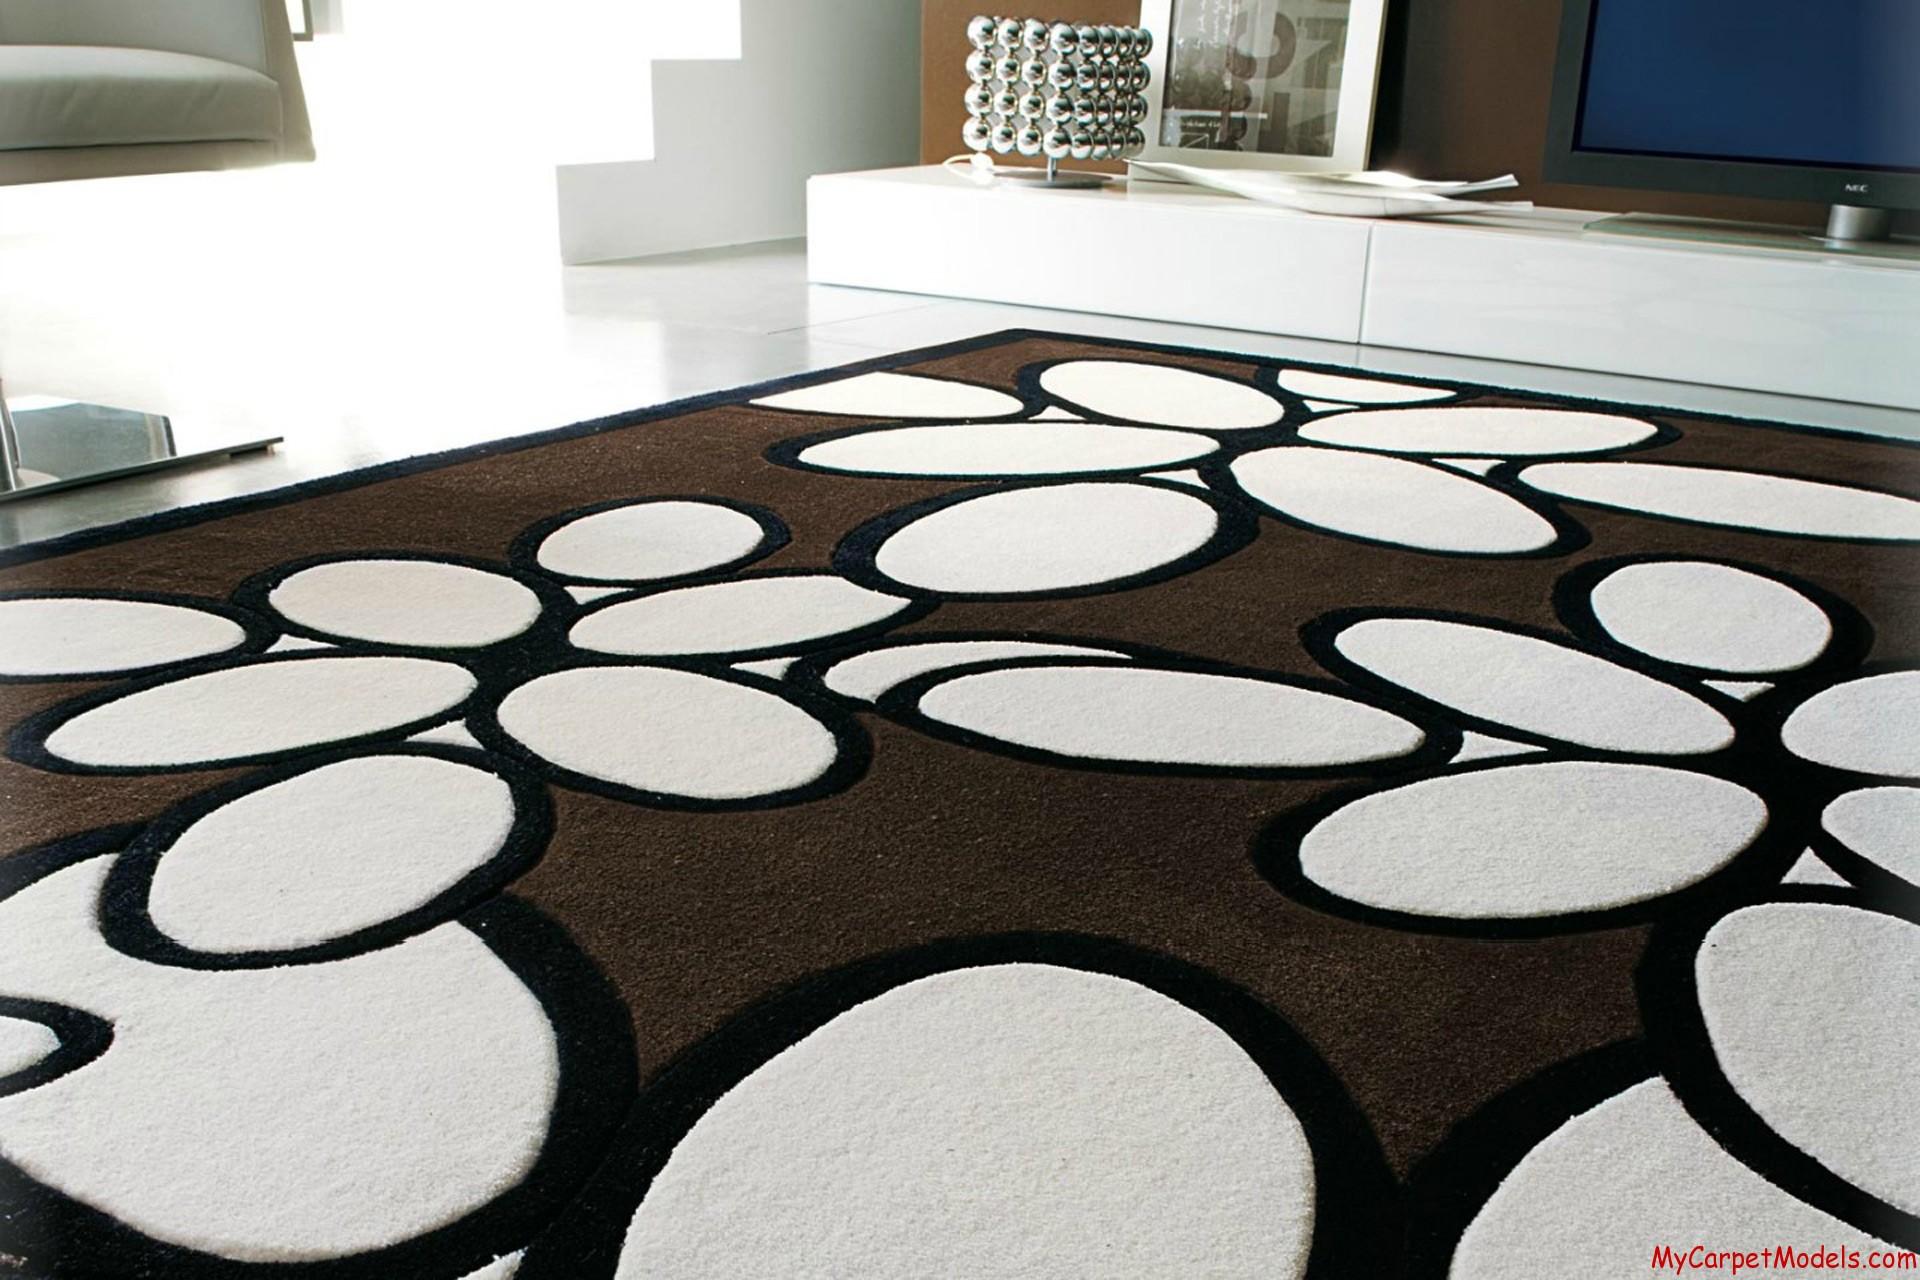 carpet designs fetching wood blinds dark designs for living room design with carpet  unlimited EBKBQIR